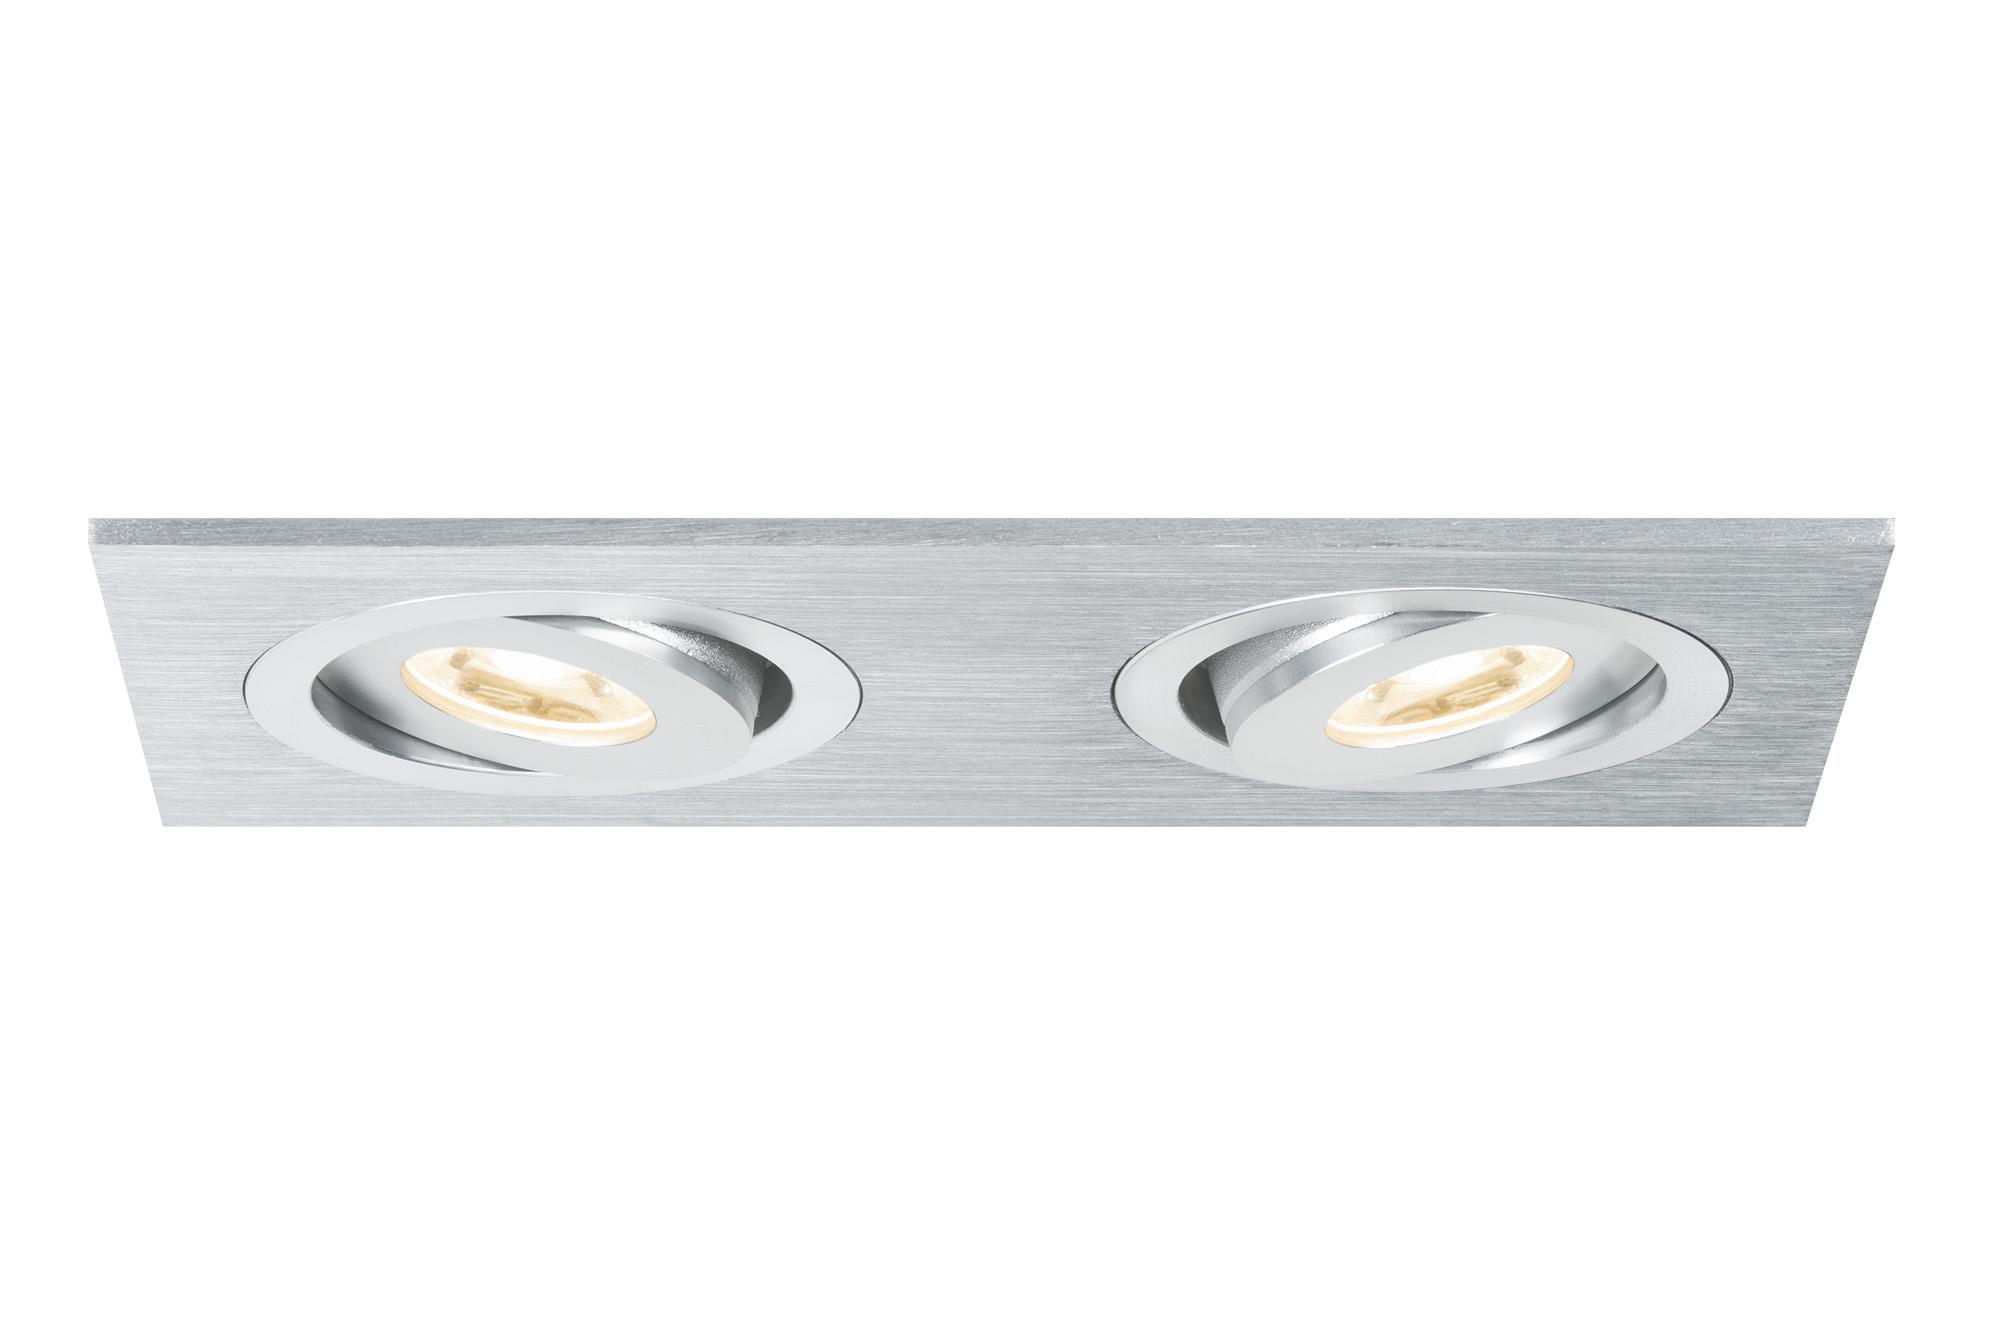 Paulmann. 92537 Светильник Premium EBL Set Drilled AluDouLED schw